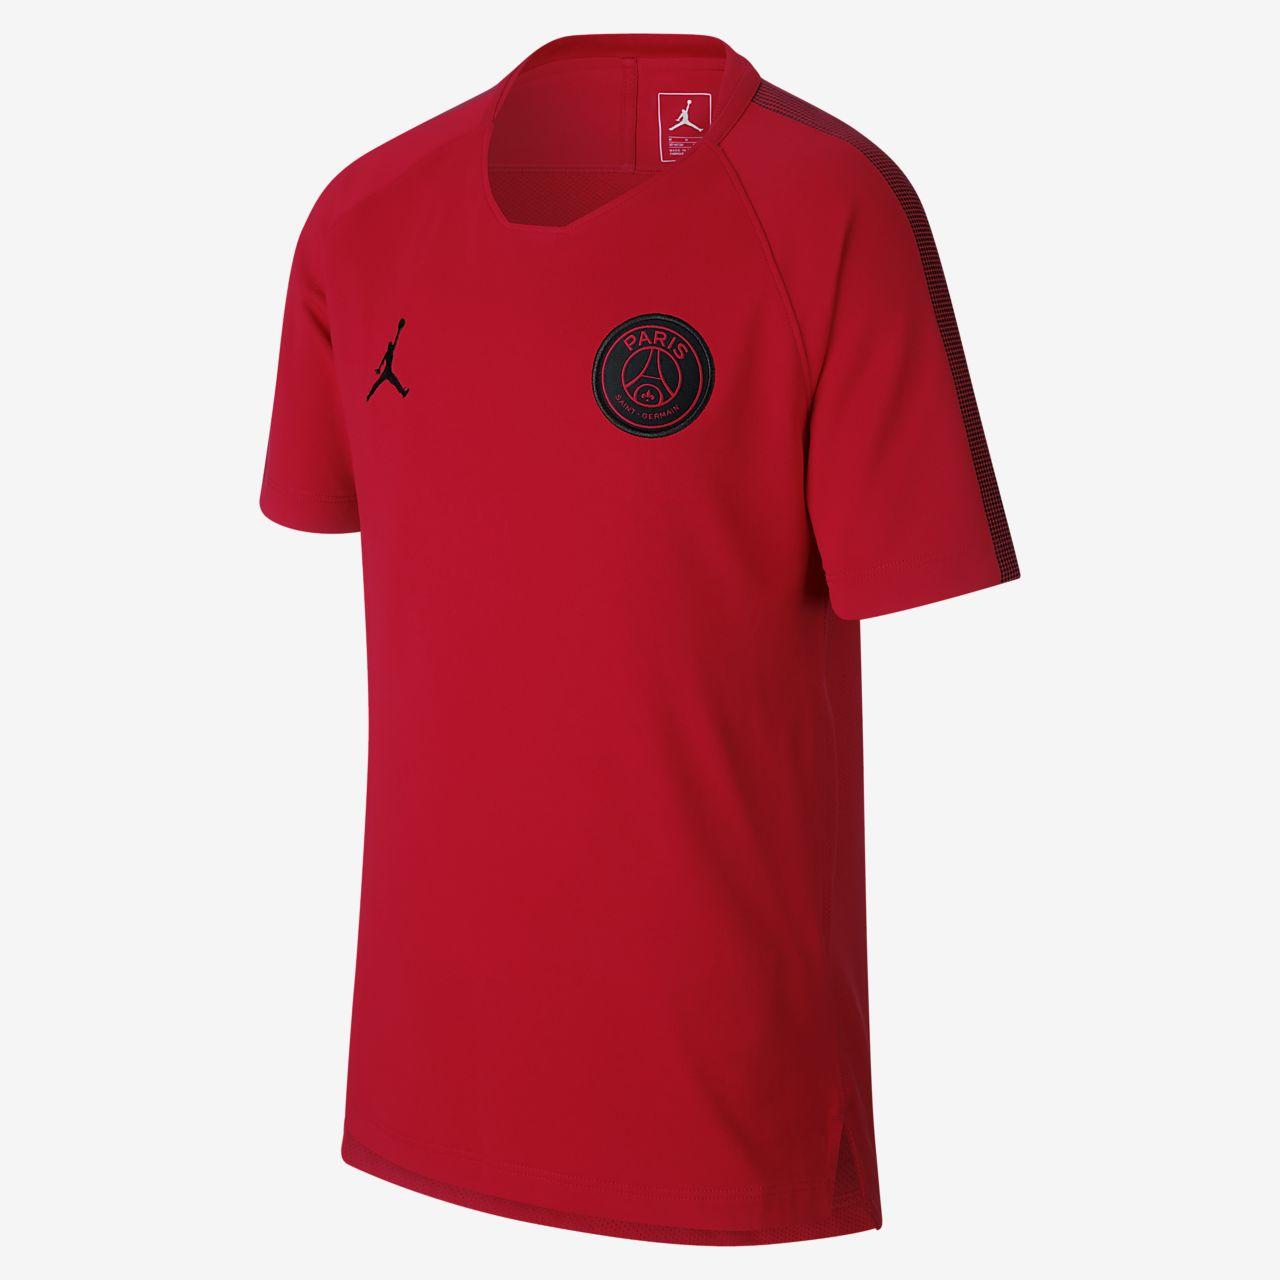 Maglia da calcio Paris Saint-Germain Breathe Squad - Ragazzi